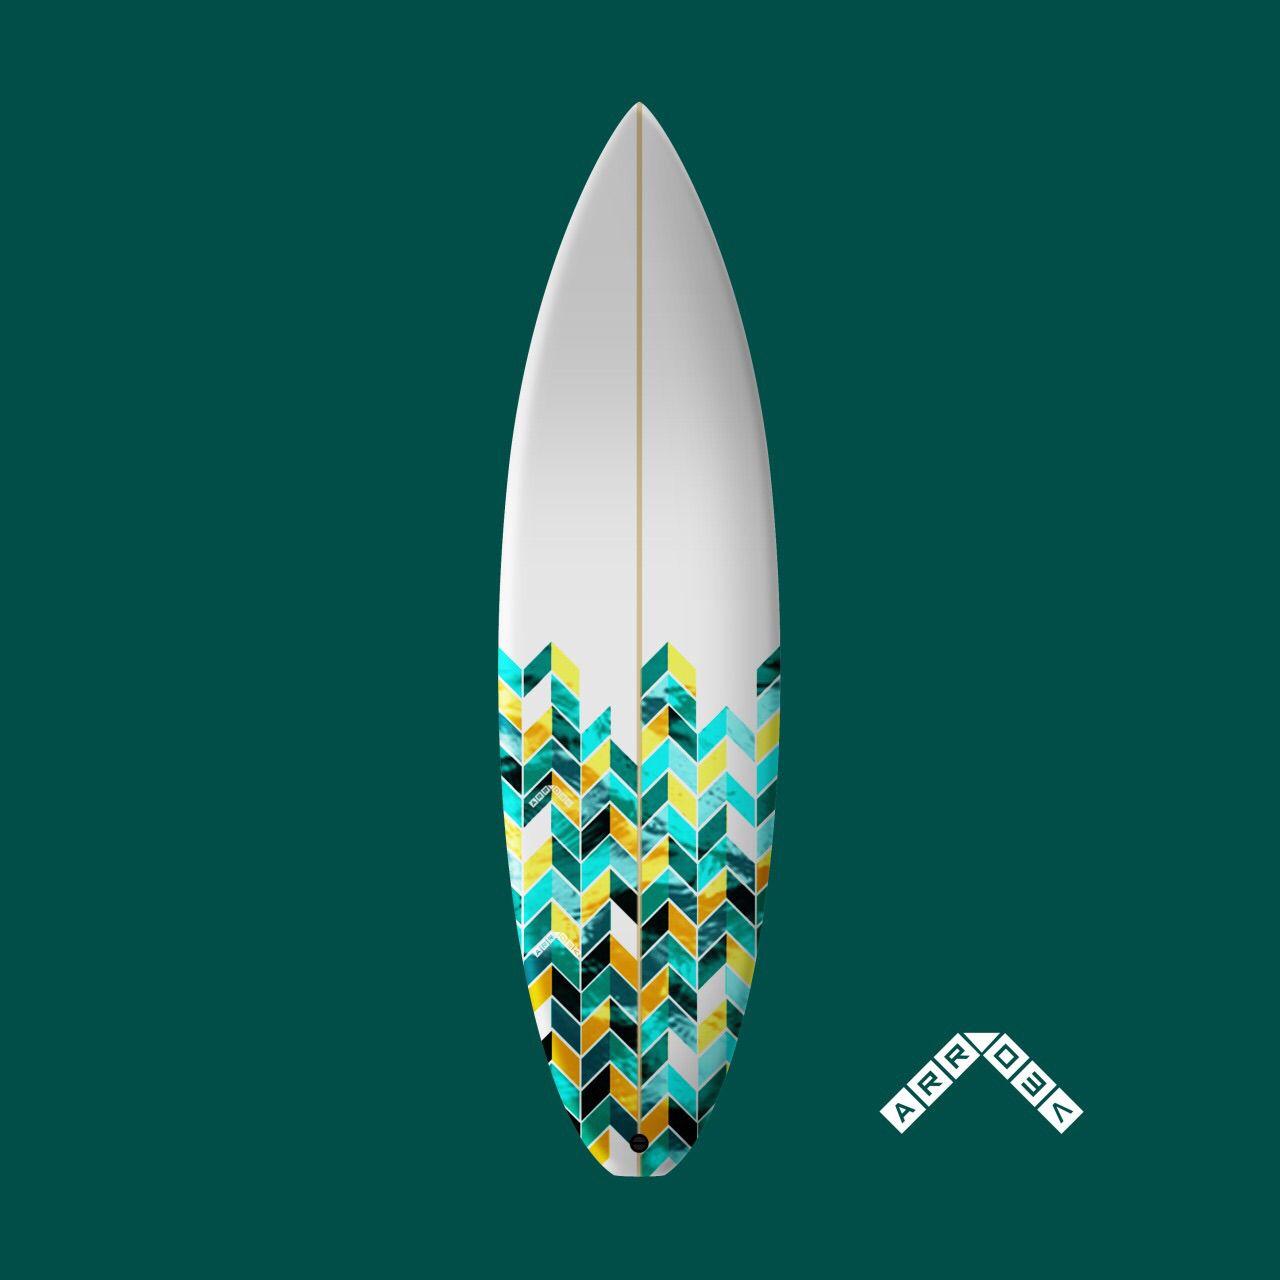 Arrow surfboard by theCoastalCity